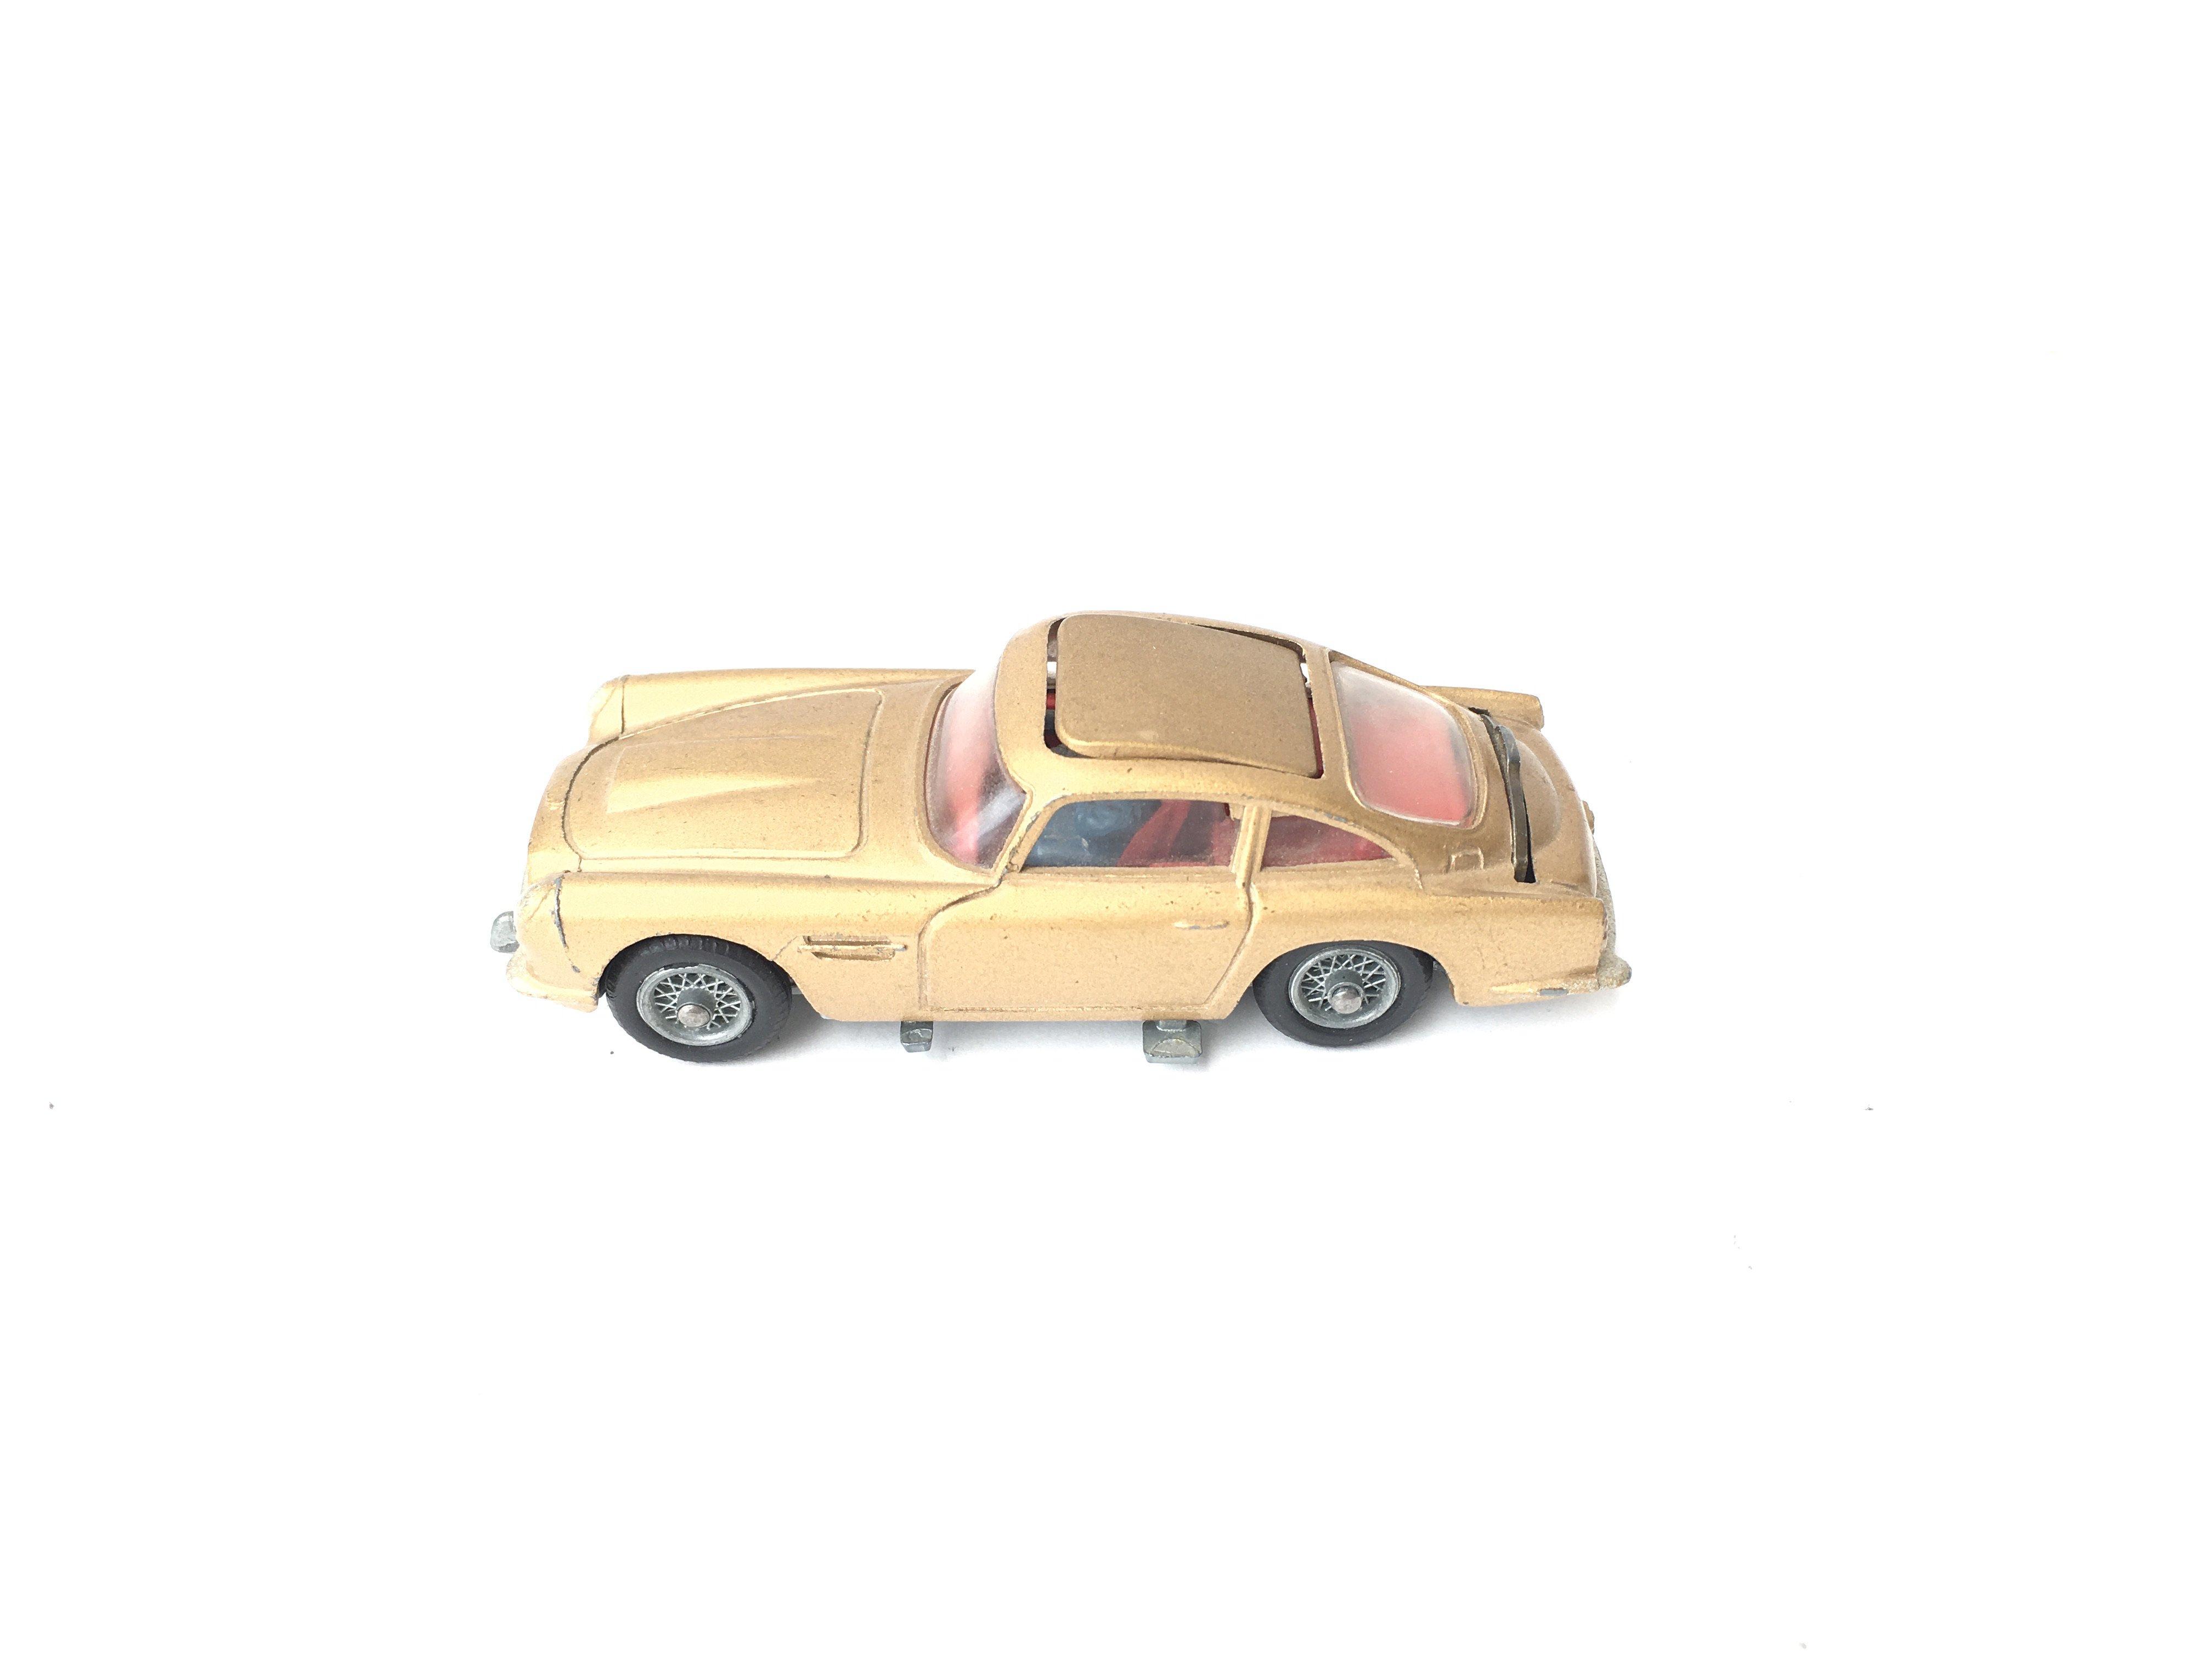 A Boxed Corgi James Bond Aston Martin D.B.5 #261. - Image 4 of 5